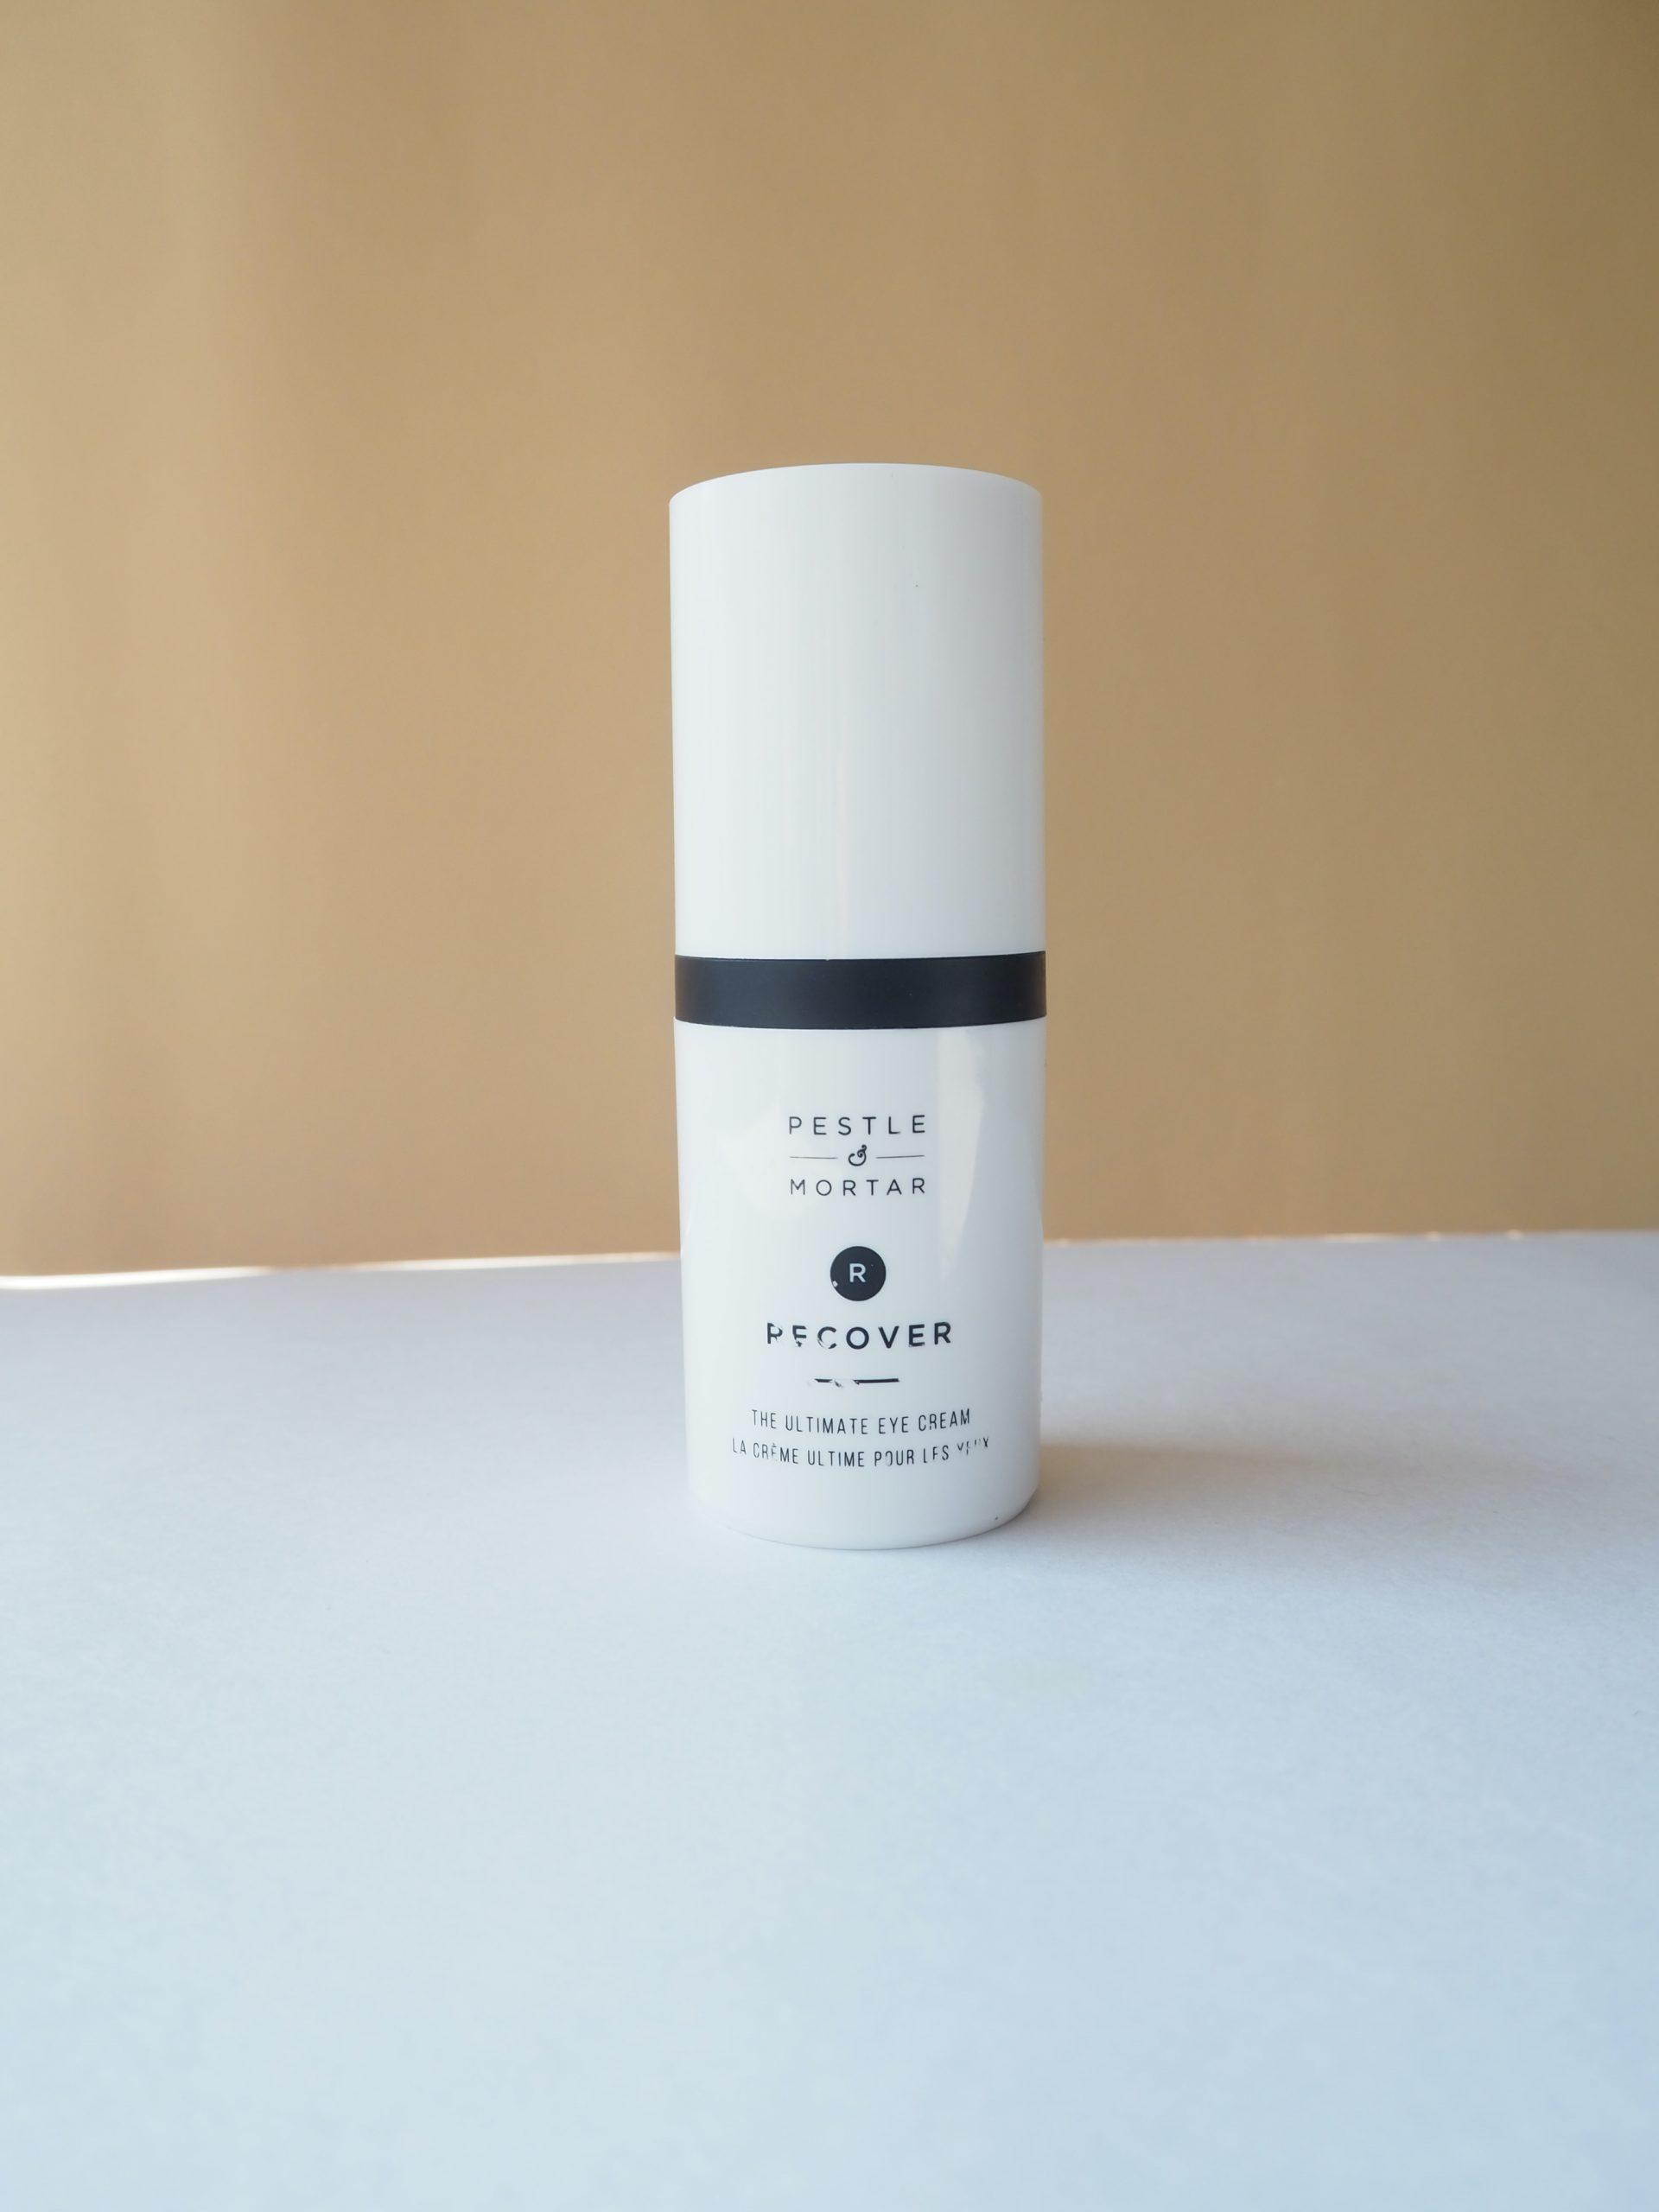 Review creme de olhos hidratante Pestle & Mortar Recover